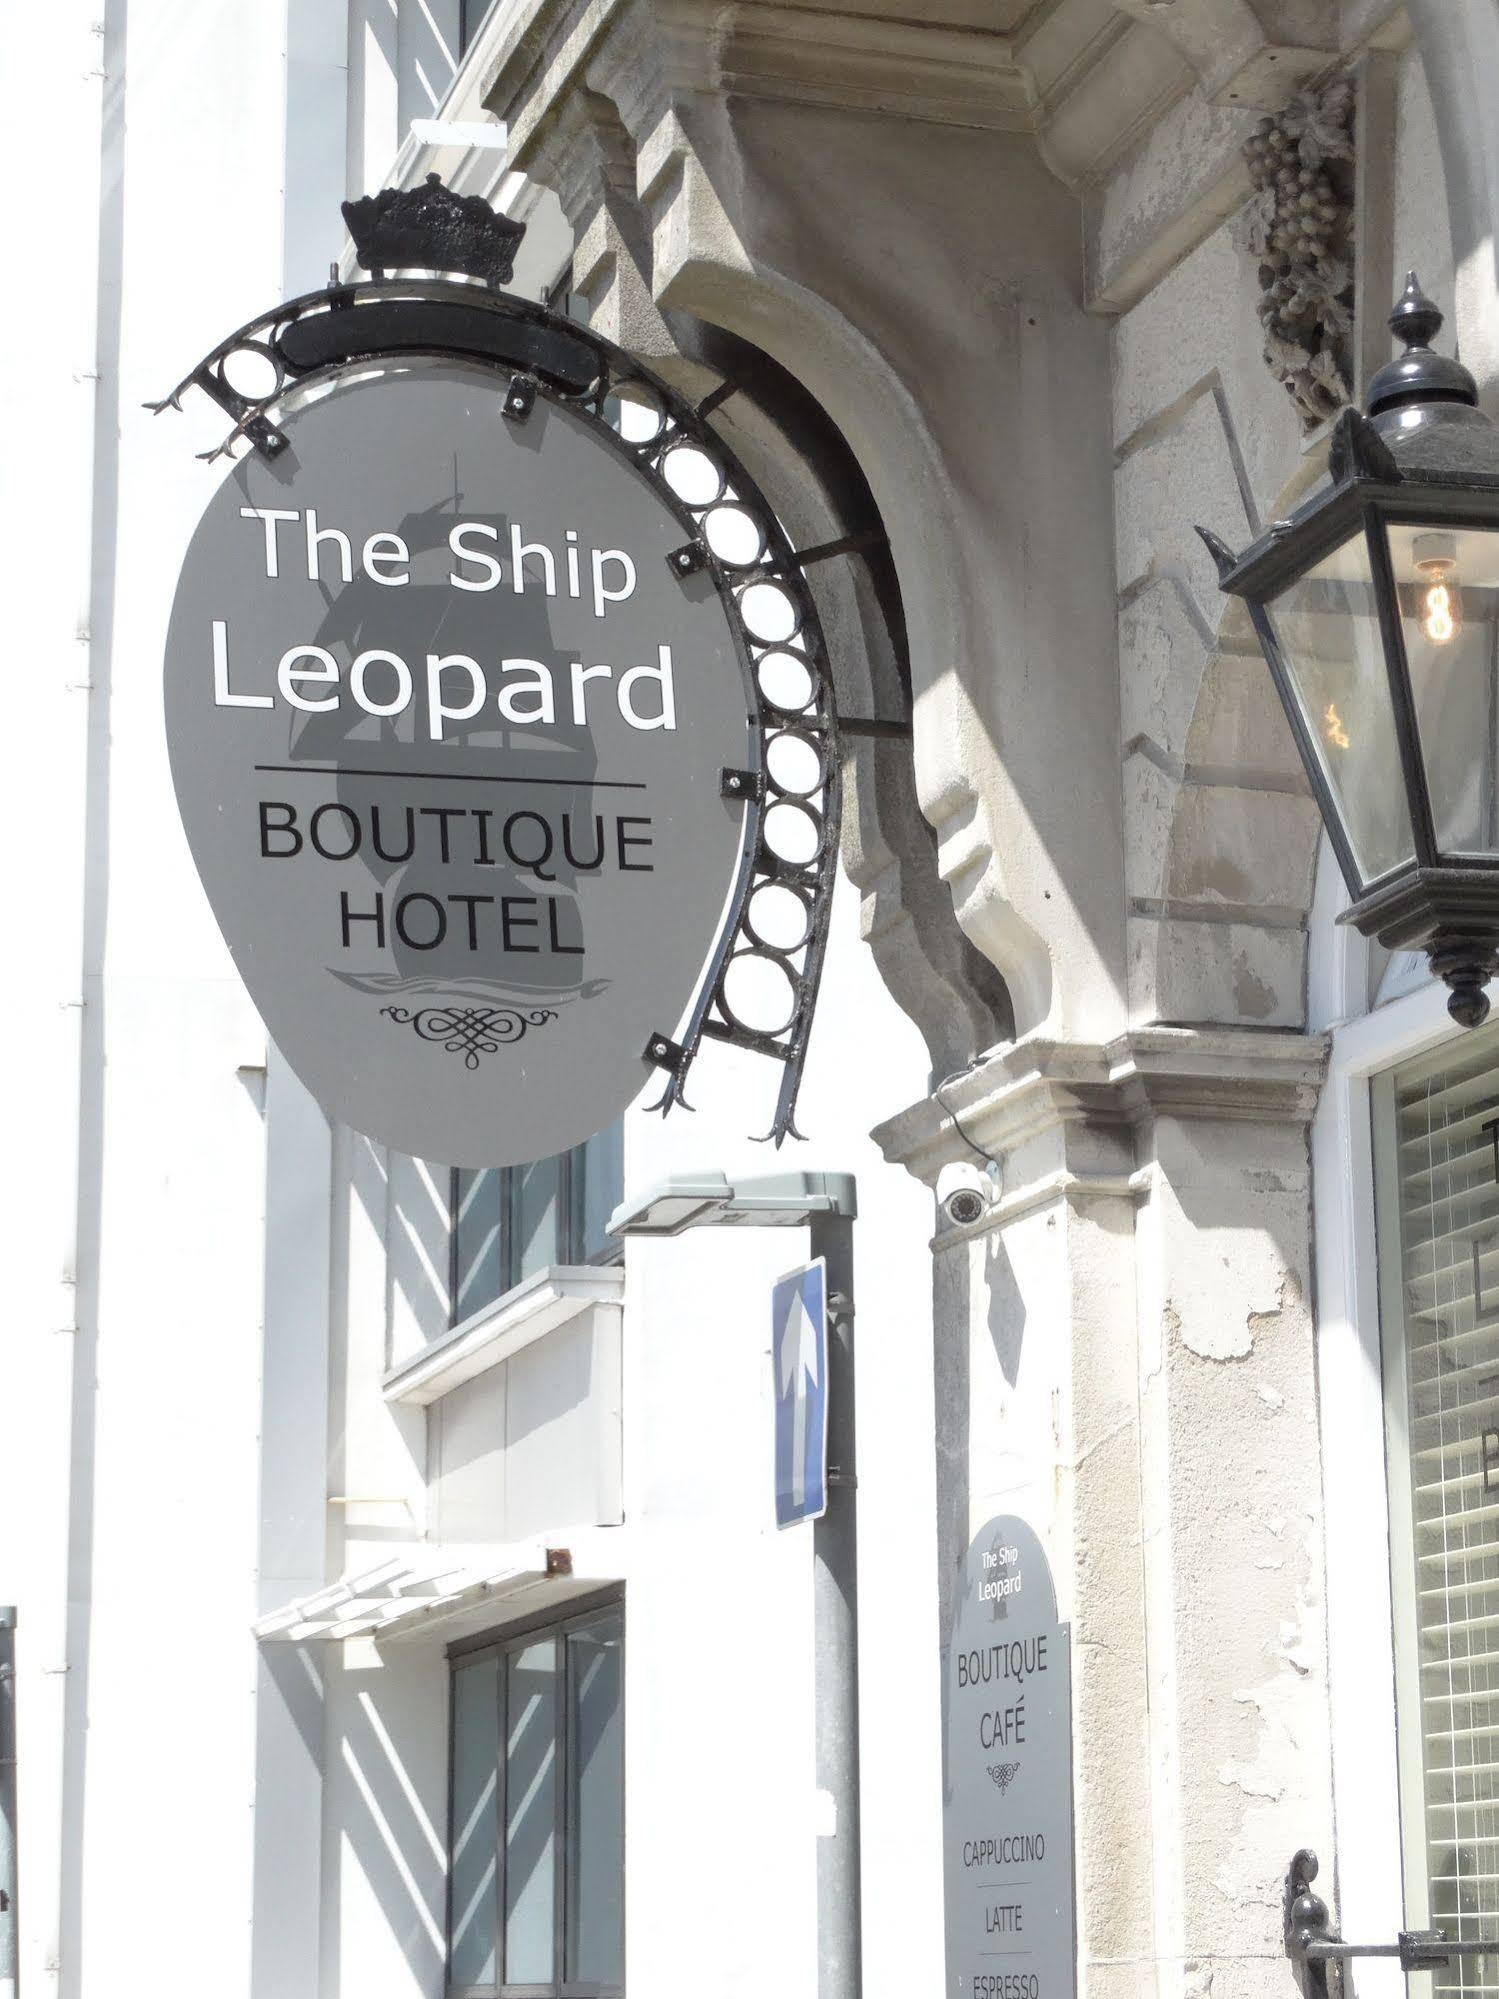 The Ship Leopard Boutique Hotel